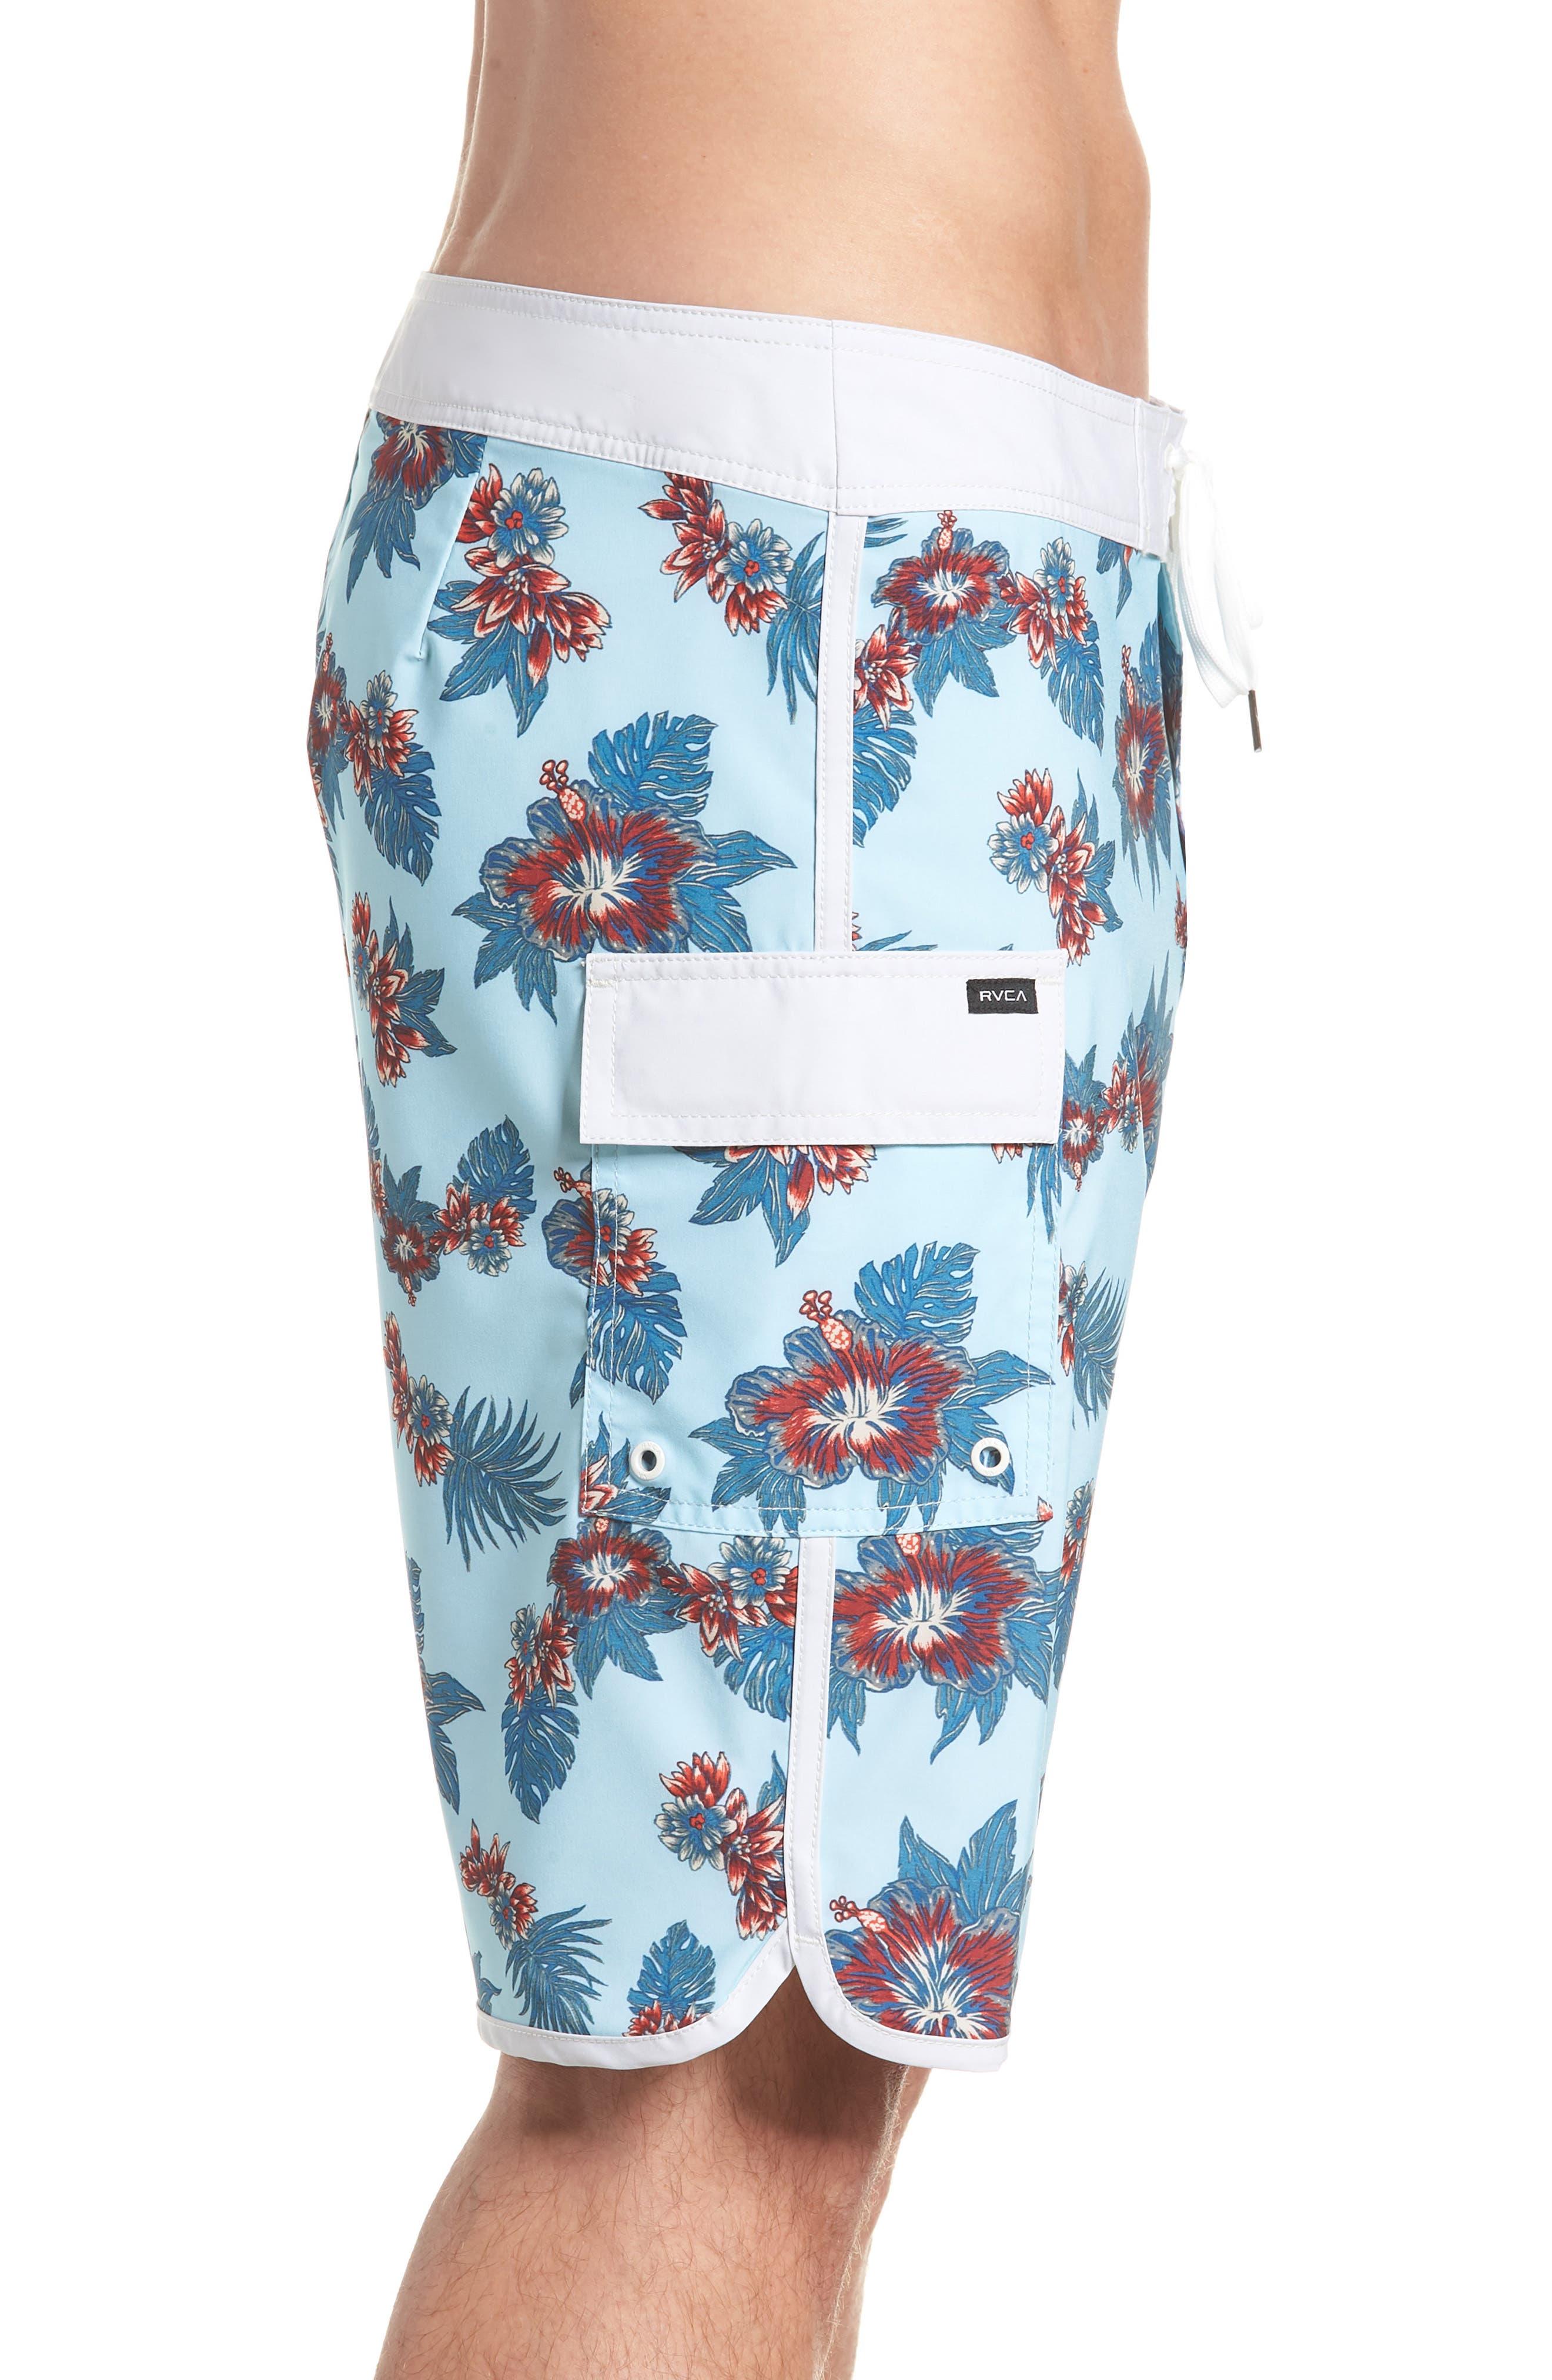 Jeff McMillan Floral Swim Trunks,                             Alternate thumbnail 4, color,                             Blue Floral